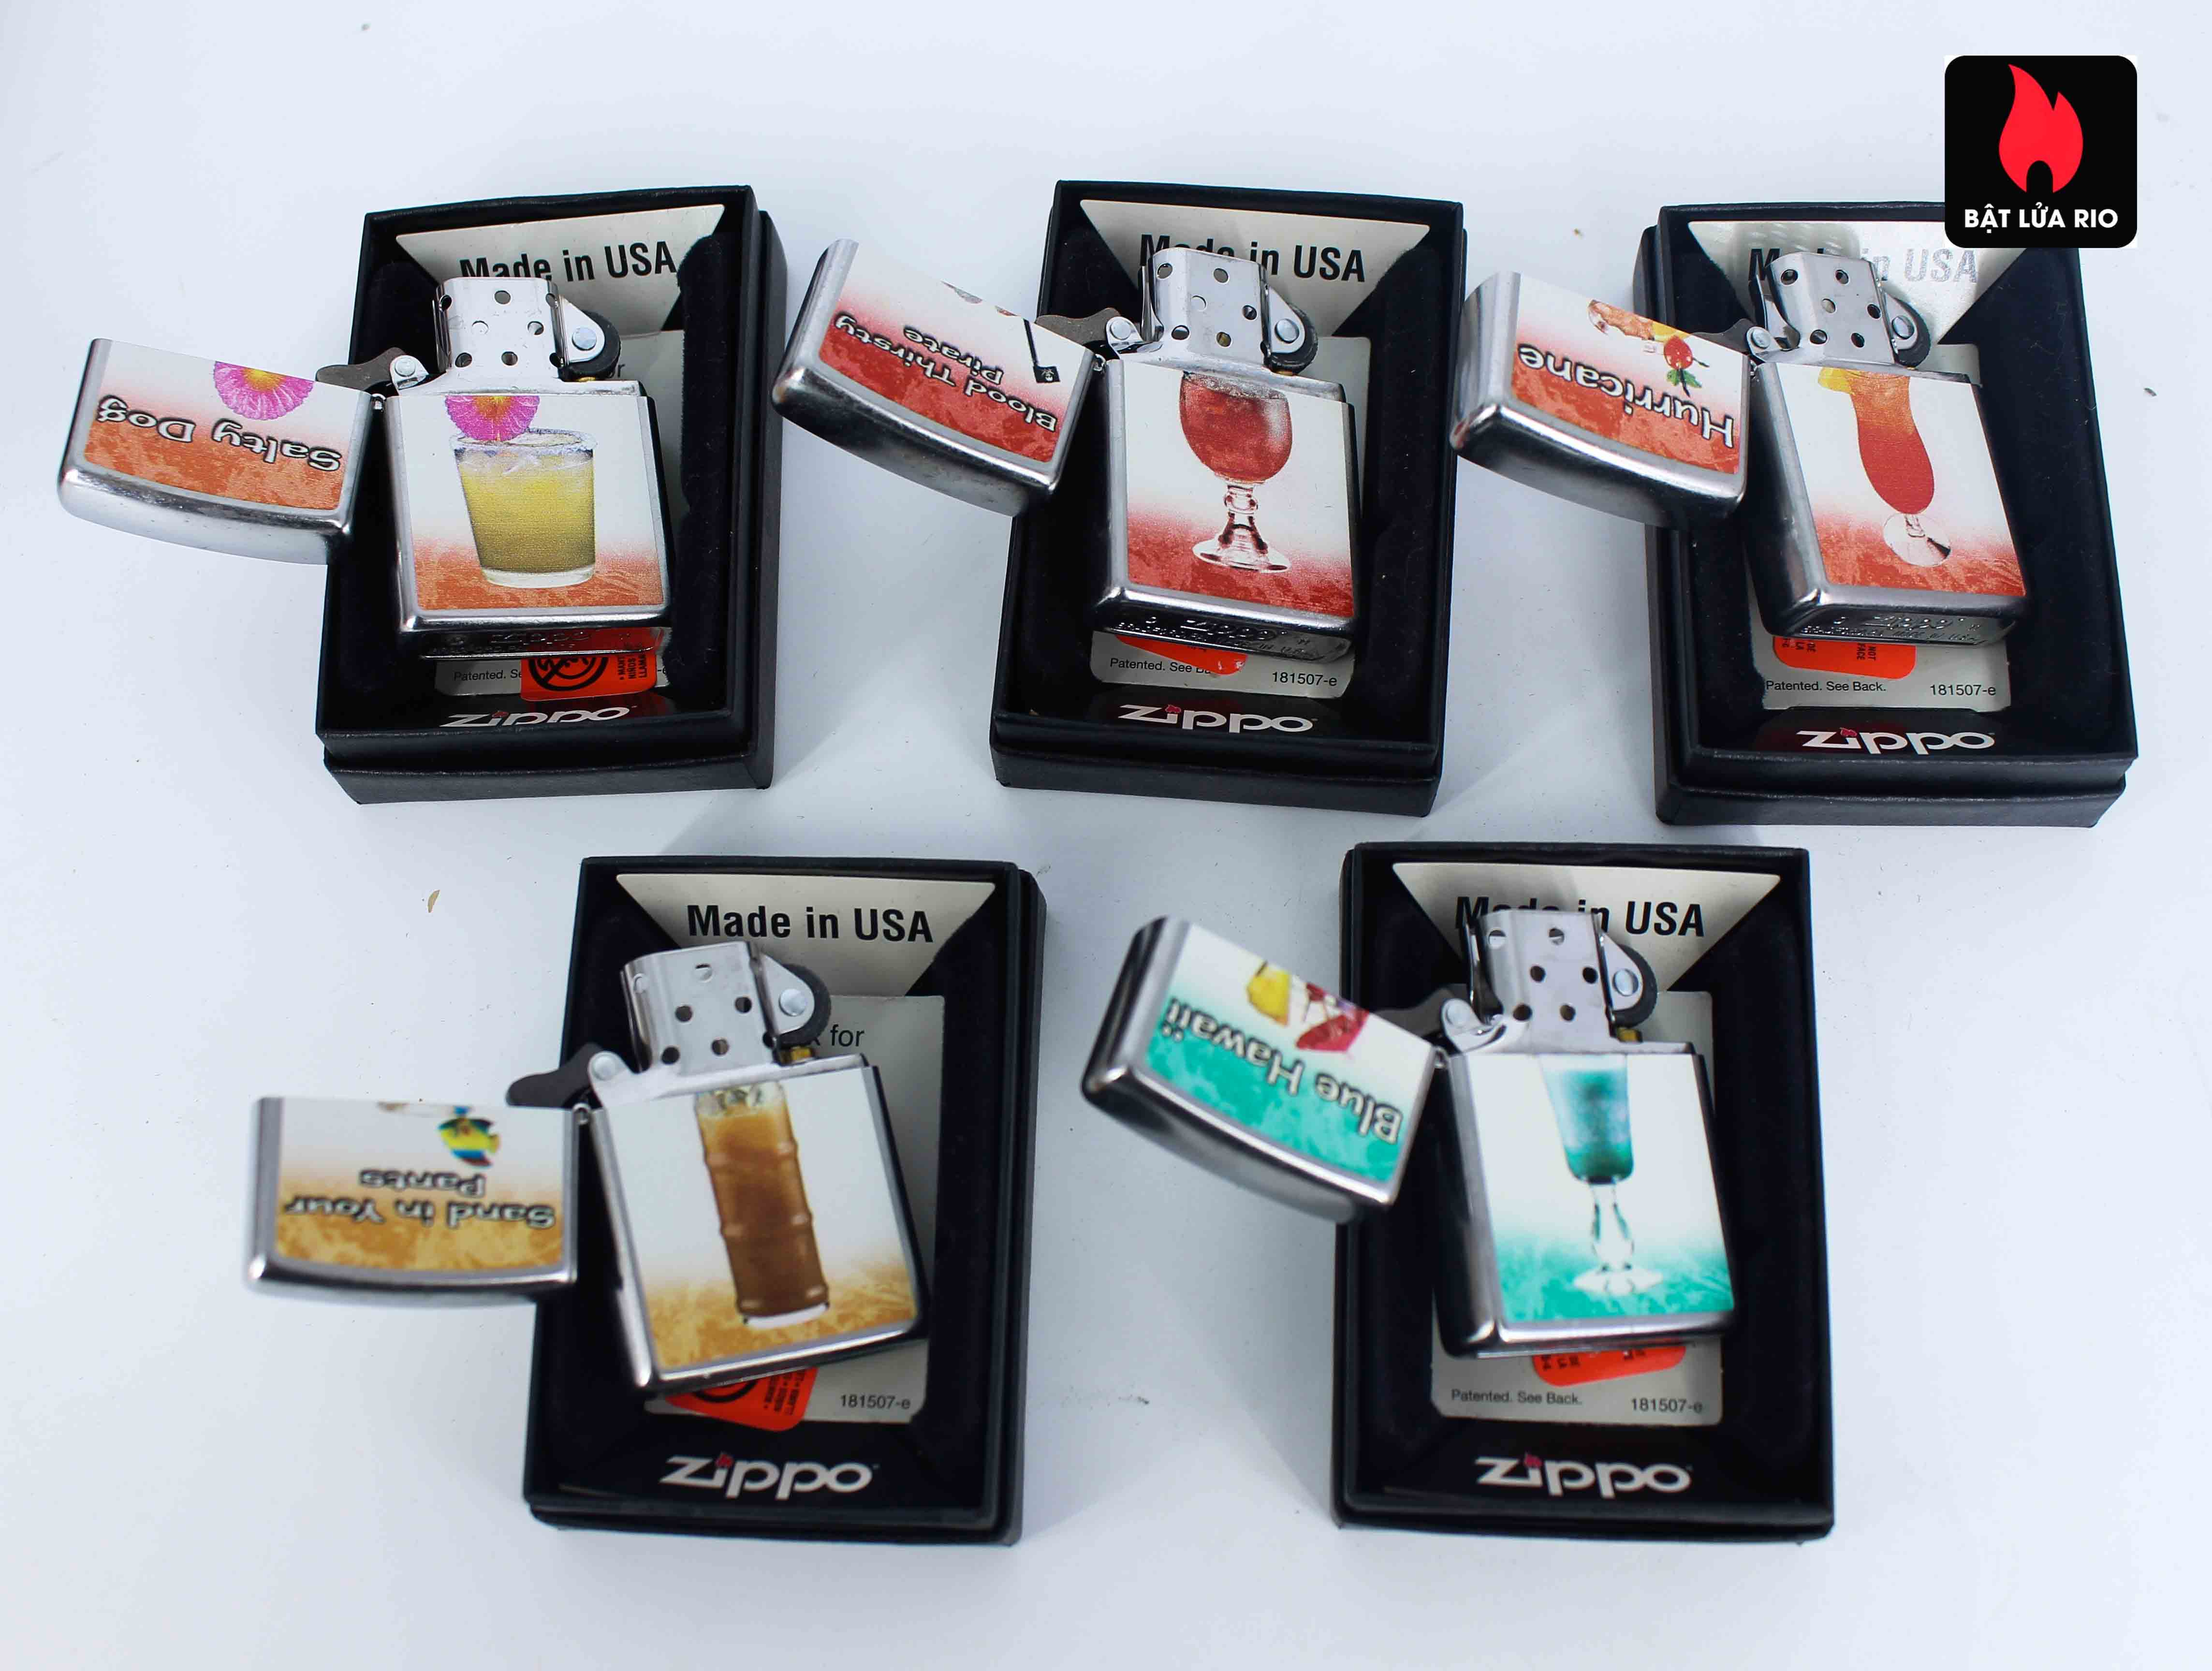 Zippo Serries 2011 - Mixed Drink 1